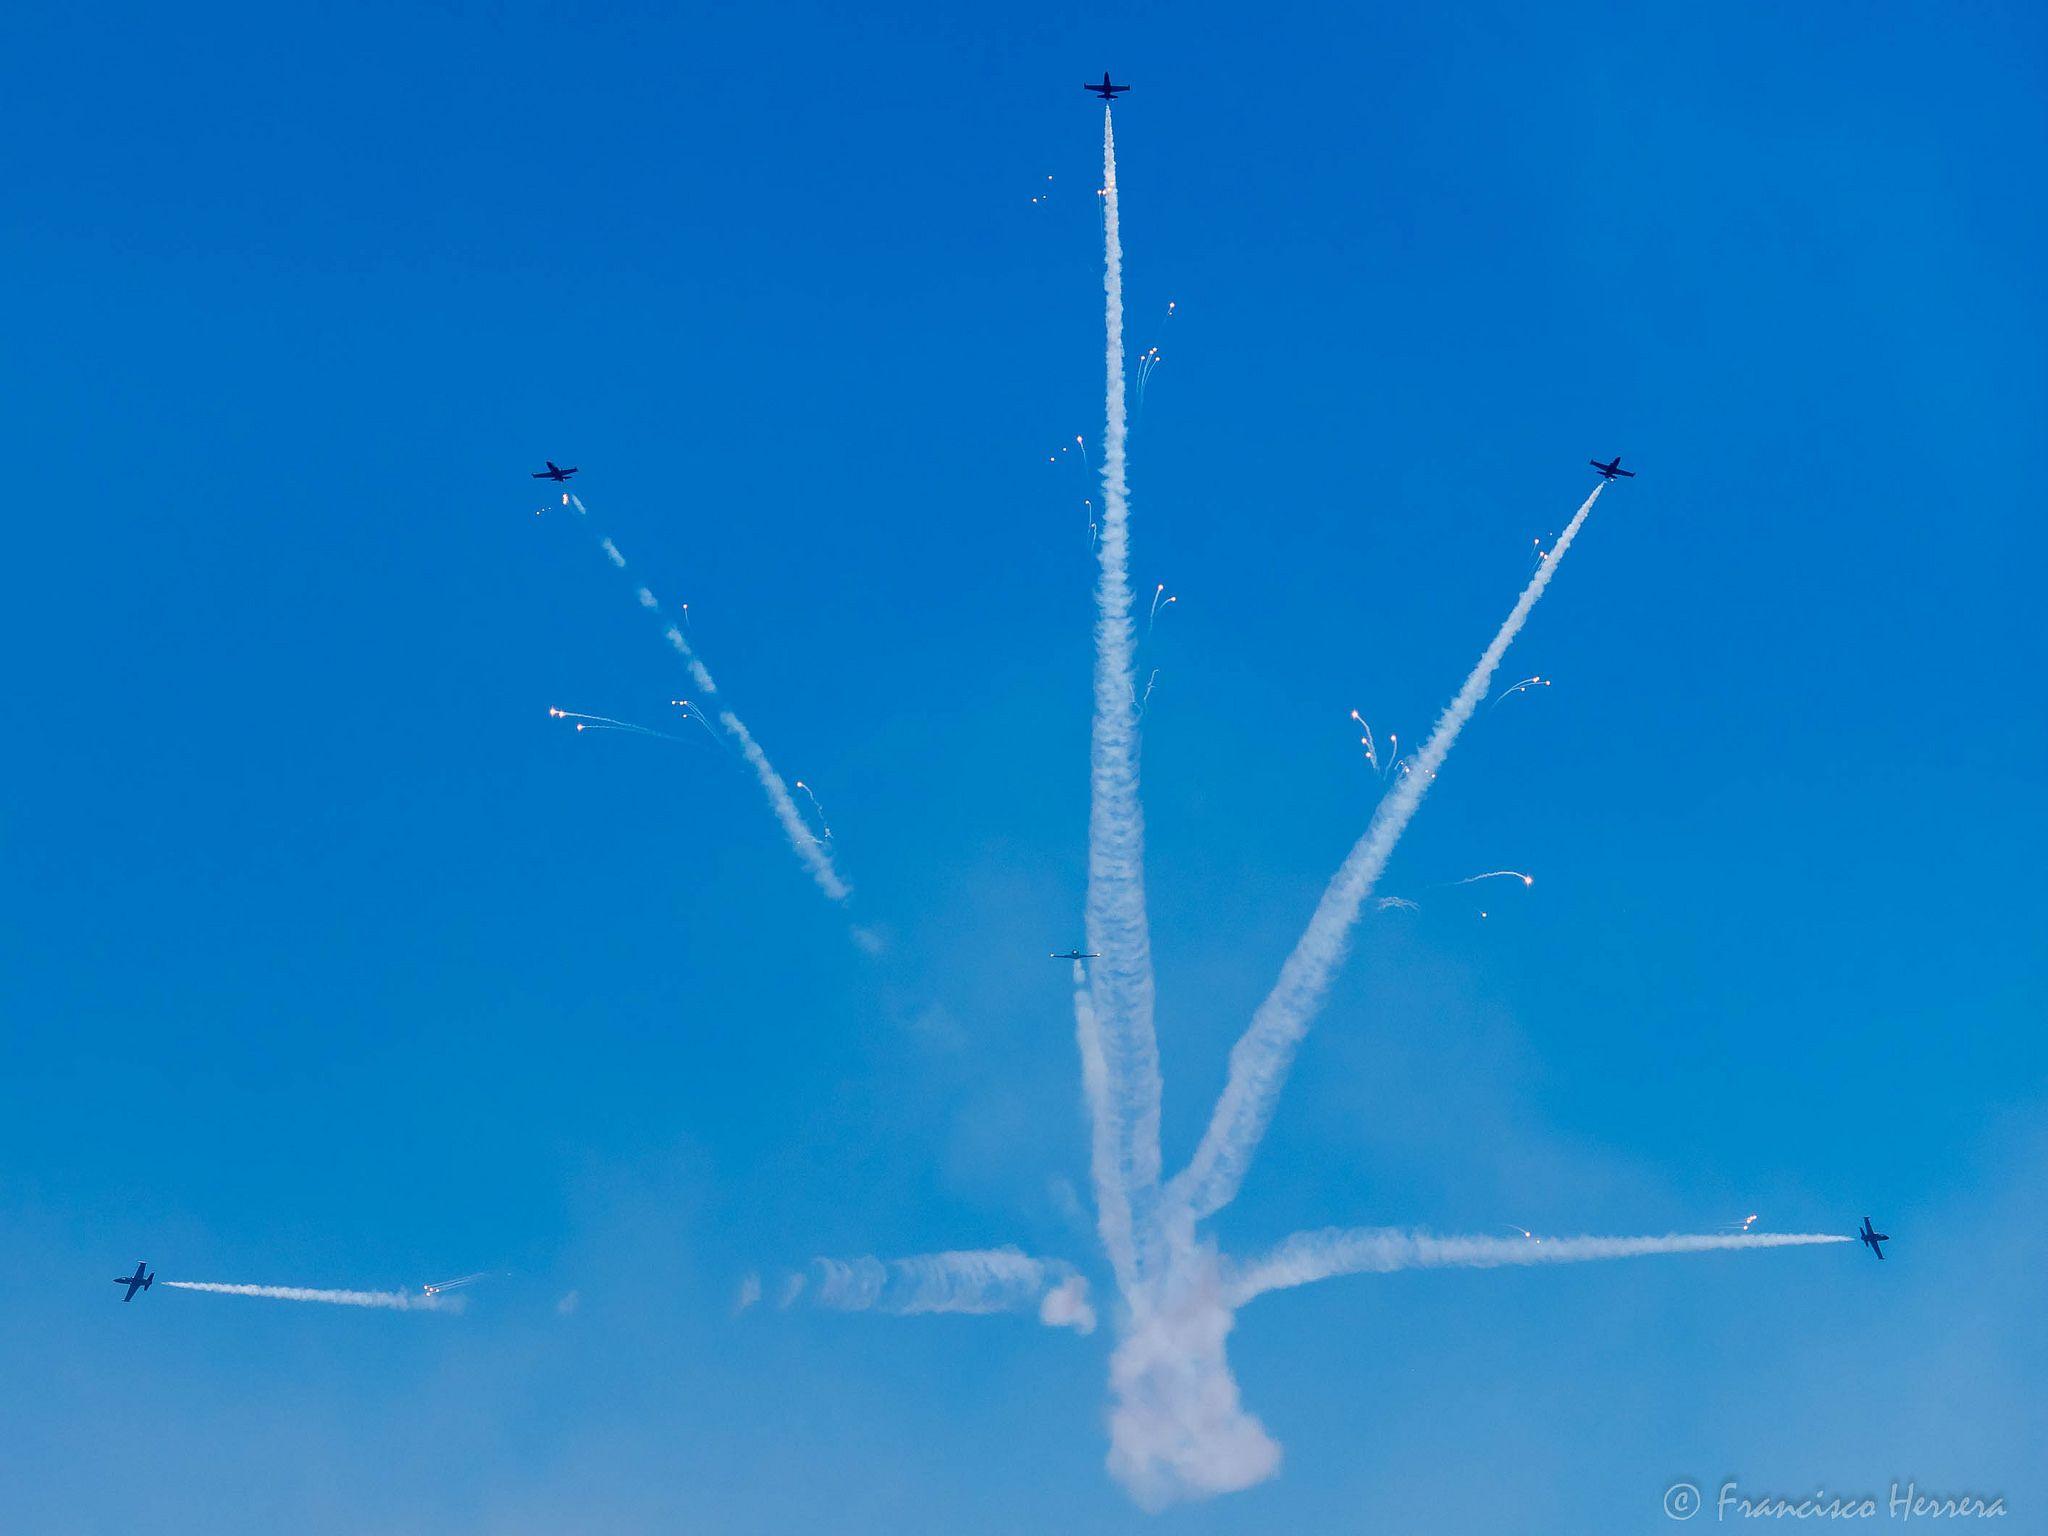 Breitling Jet Team Air show, Fort lauderdale, Jet